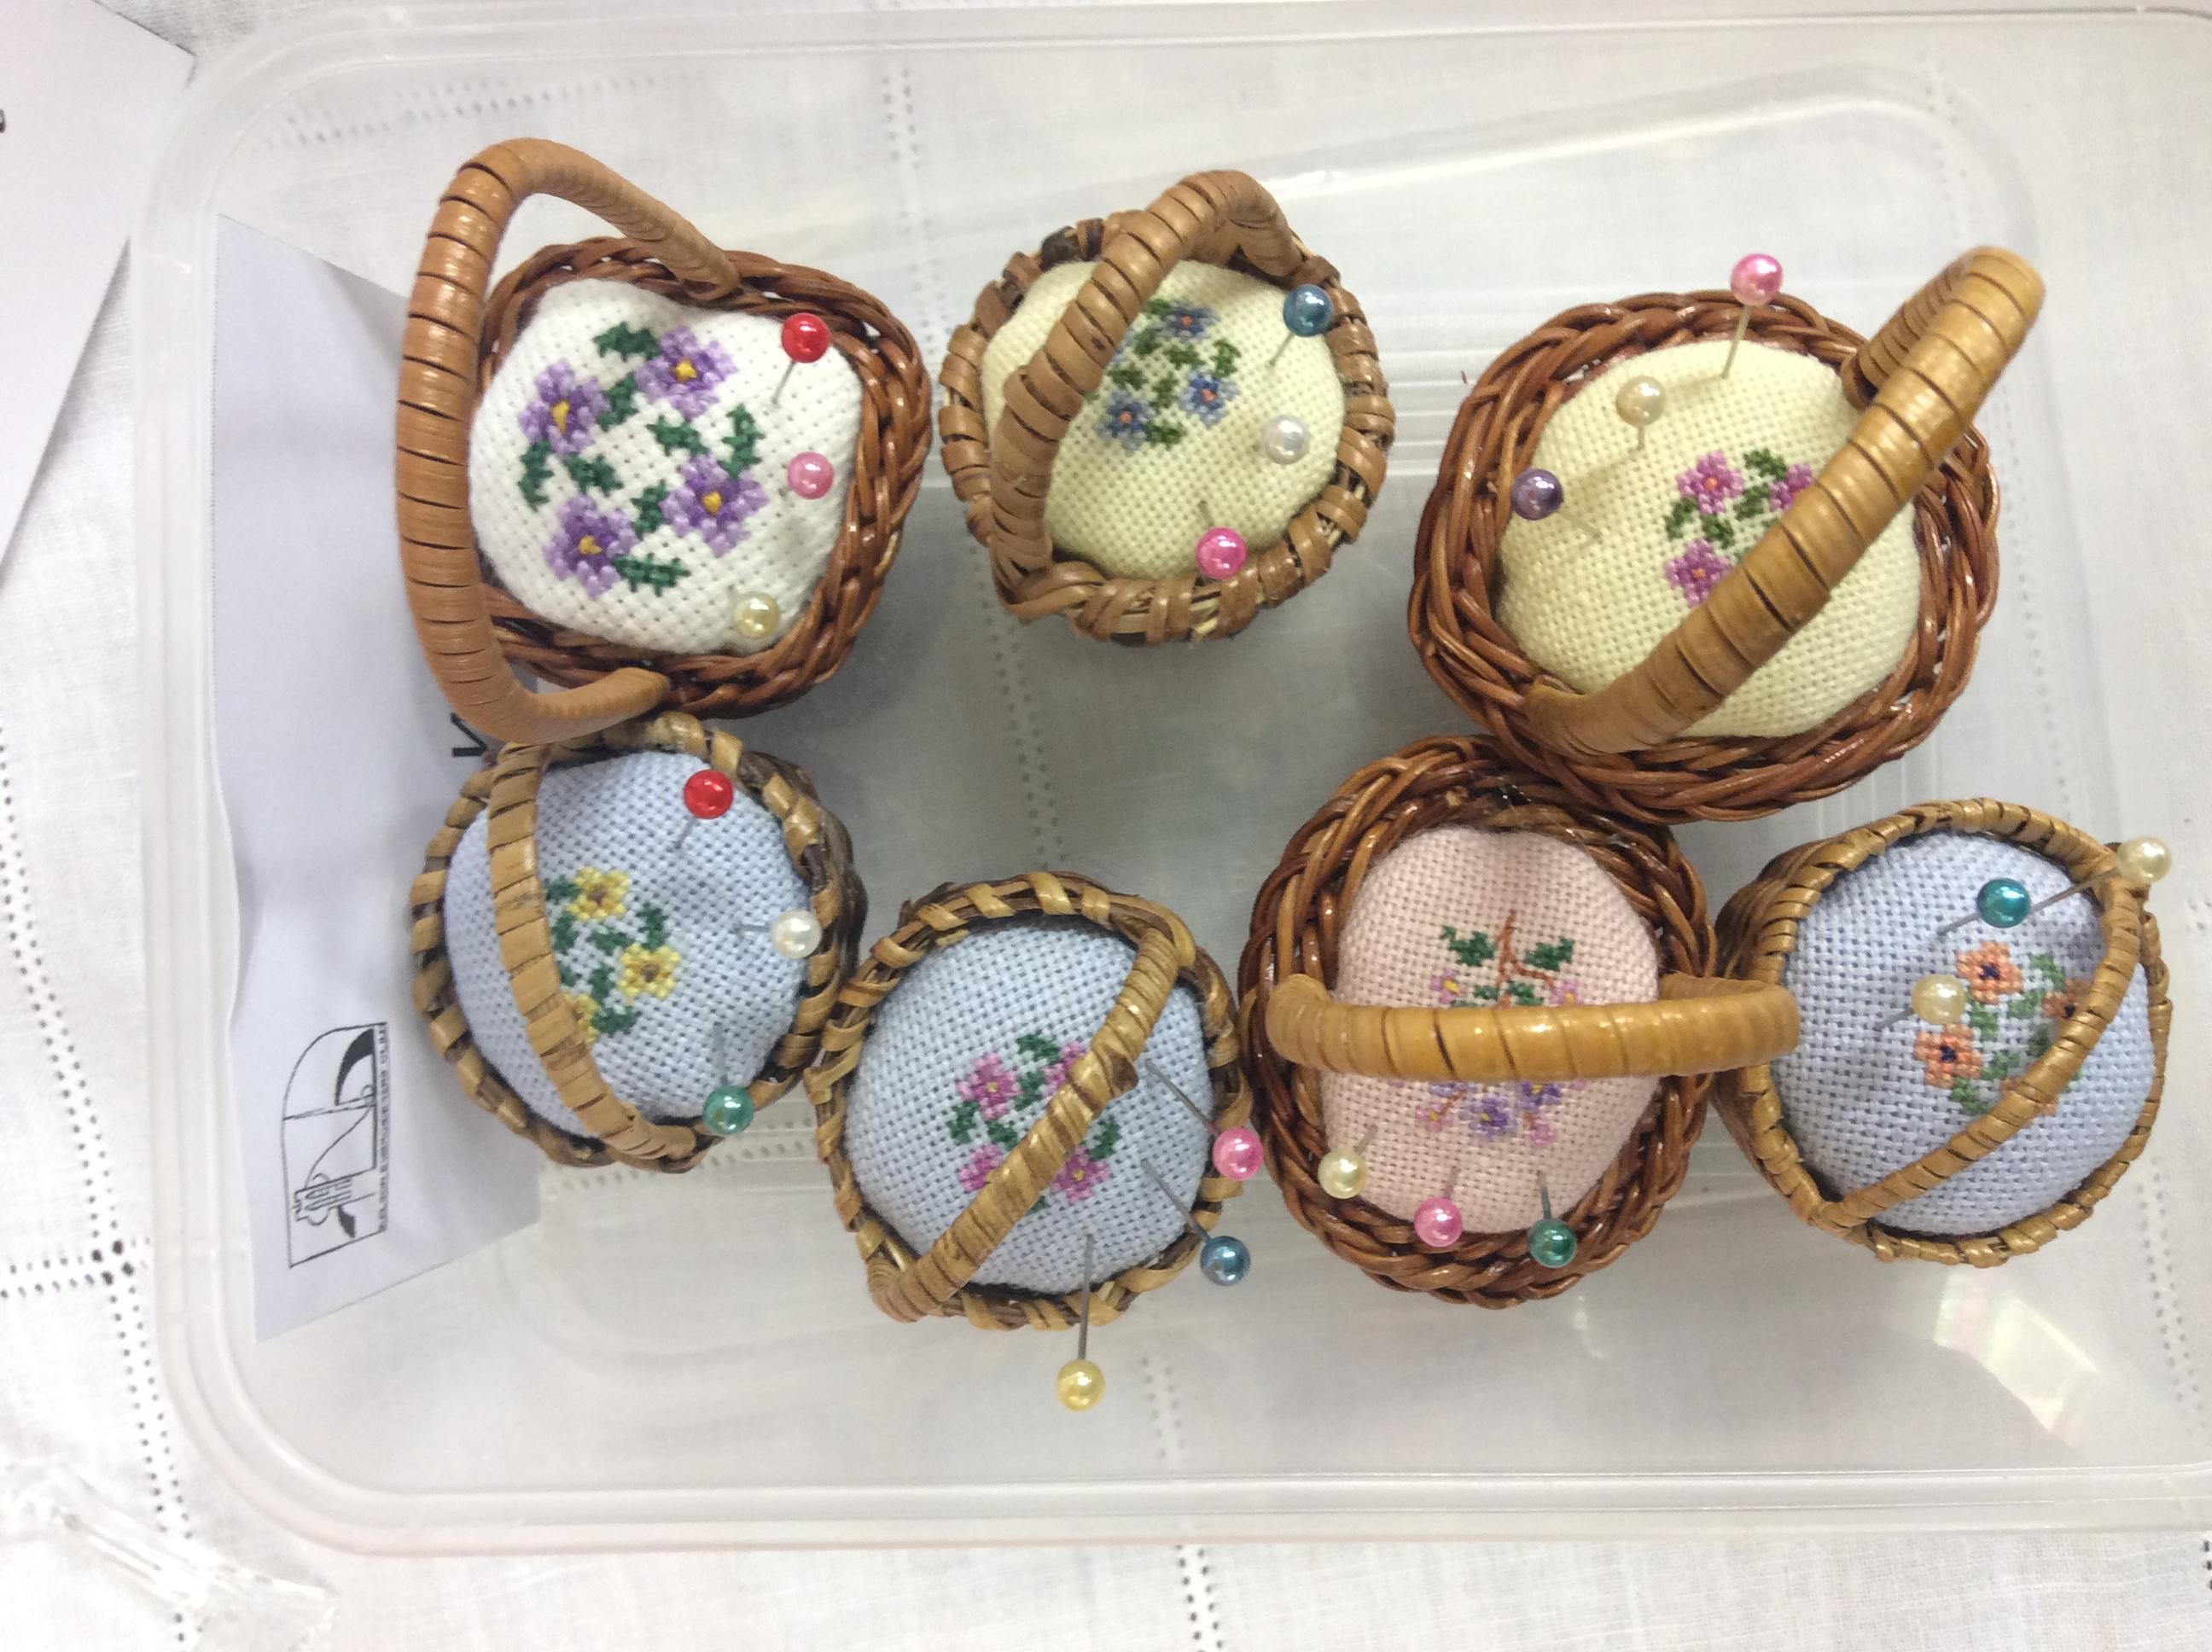 Floral pincushion baskets